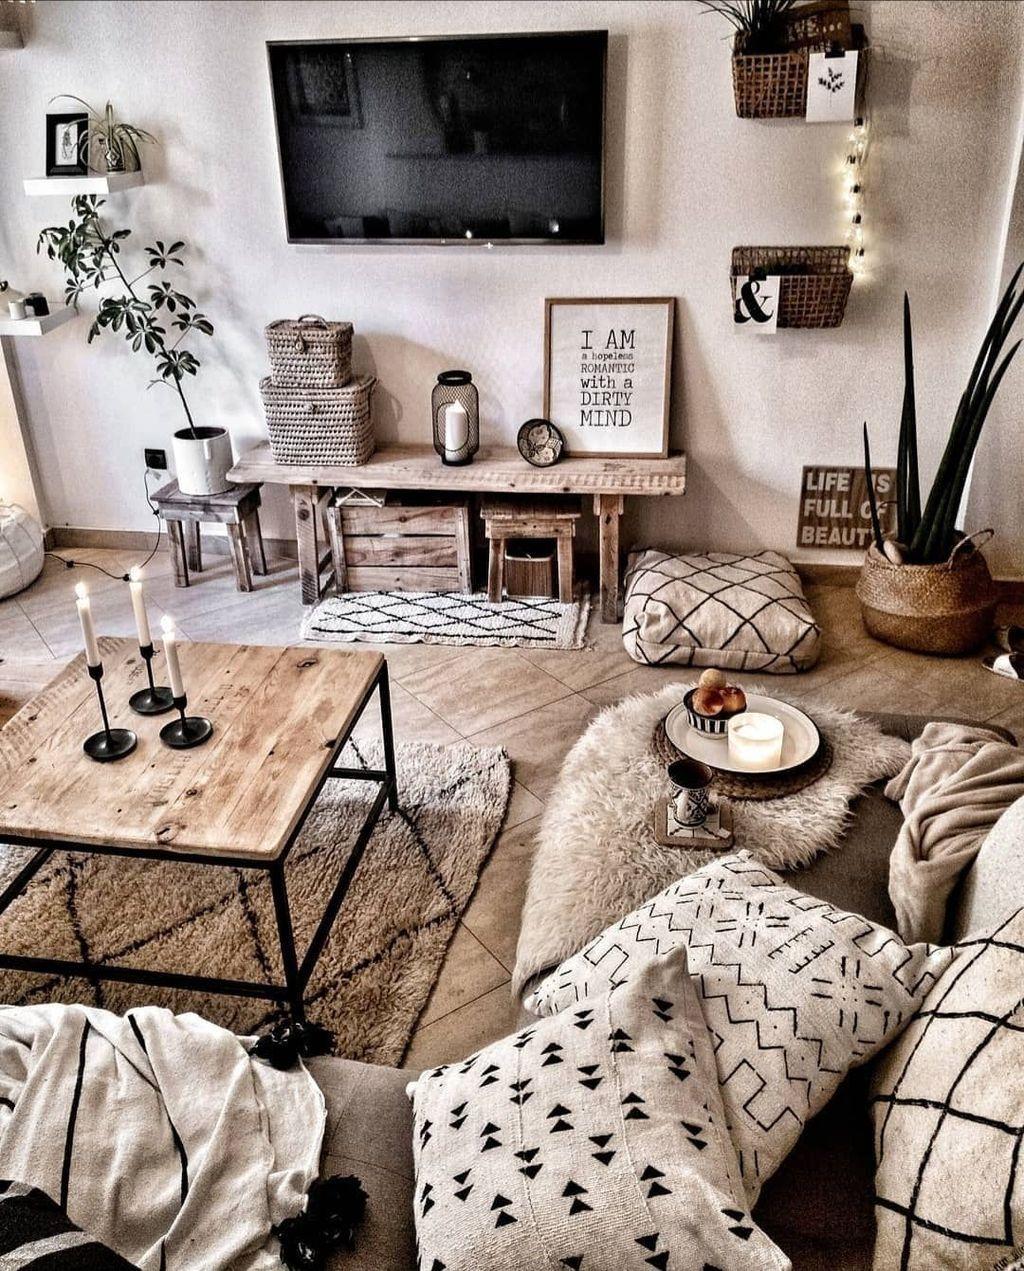 36 Fabulous Bohemian Living Room Decorating Ideas Apartment Living Room Design Simple Living Room Decor Rustic Living Room Furniture